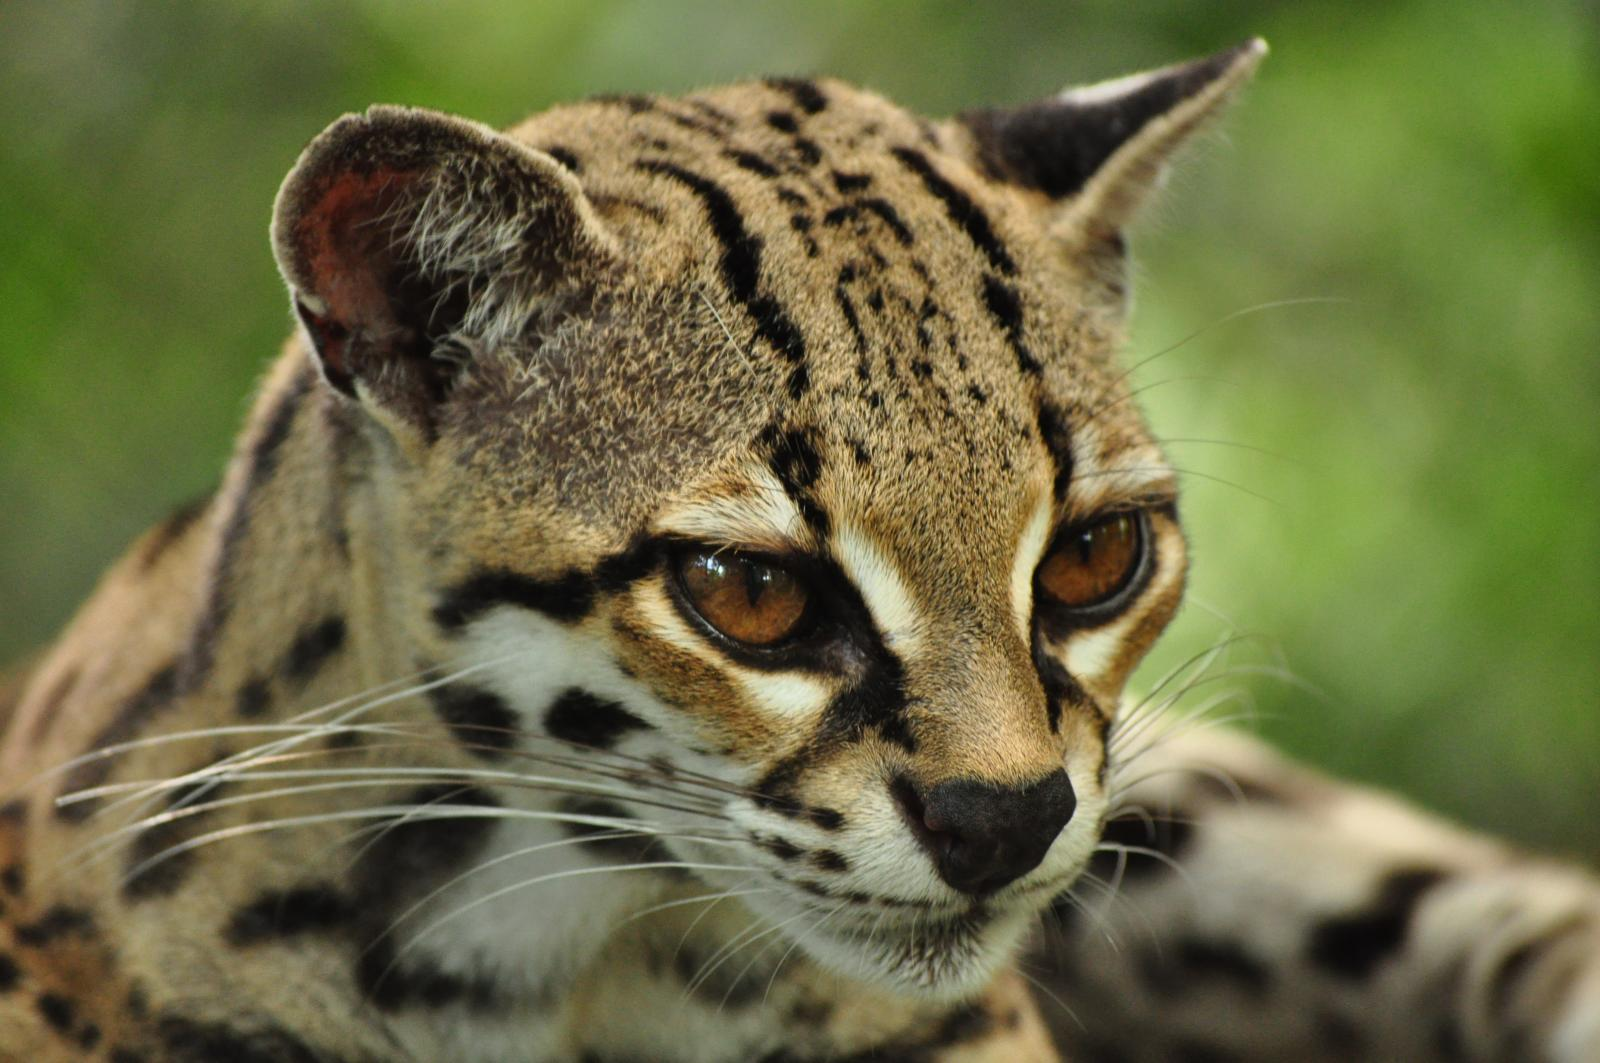 Wild ocelot kittens - photo#19